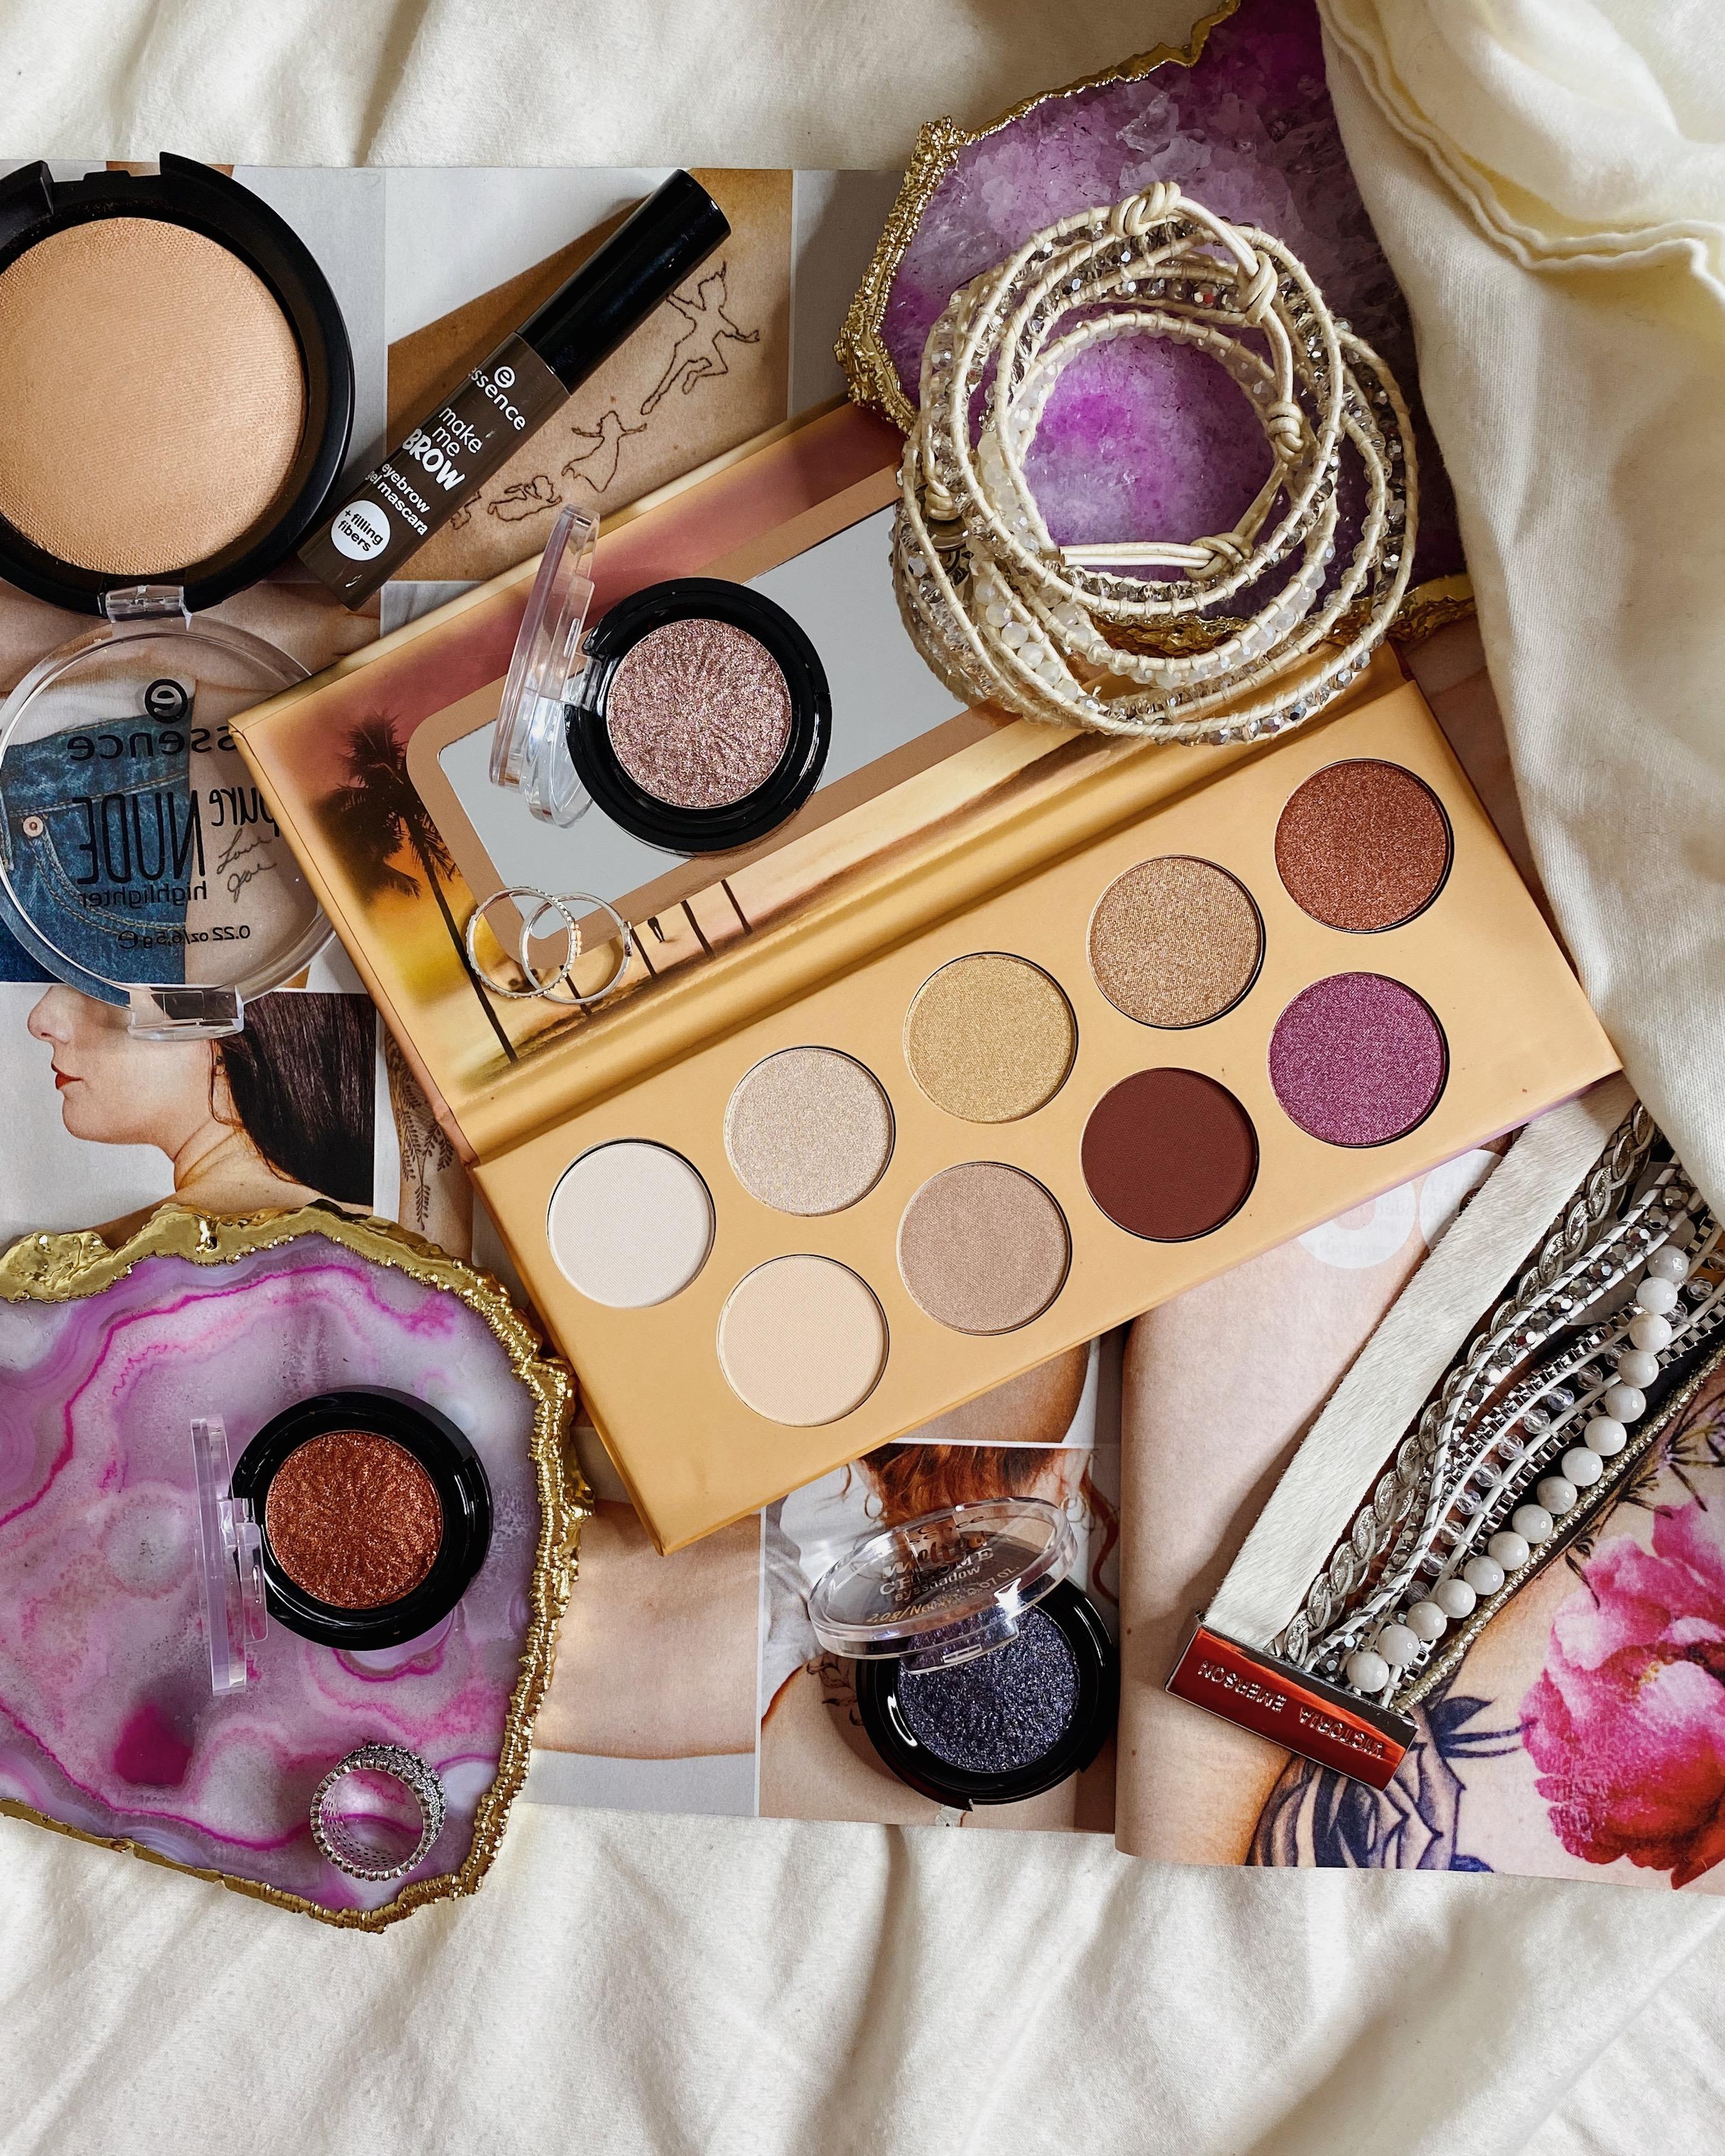 Essence Makeup Ola Rio Eyeshadow Palette Review | Essence Melted Chrome Eyeshadows | Essence Pure Nude Highlighter